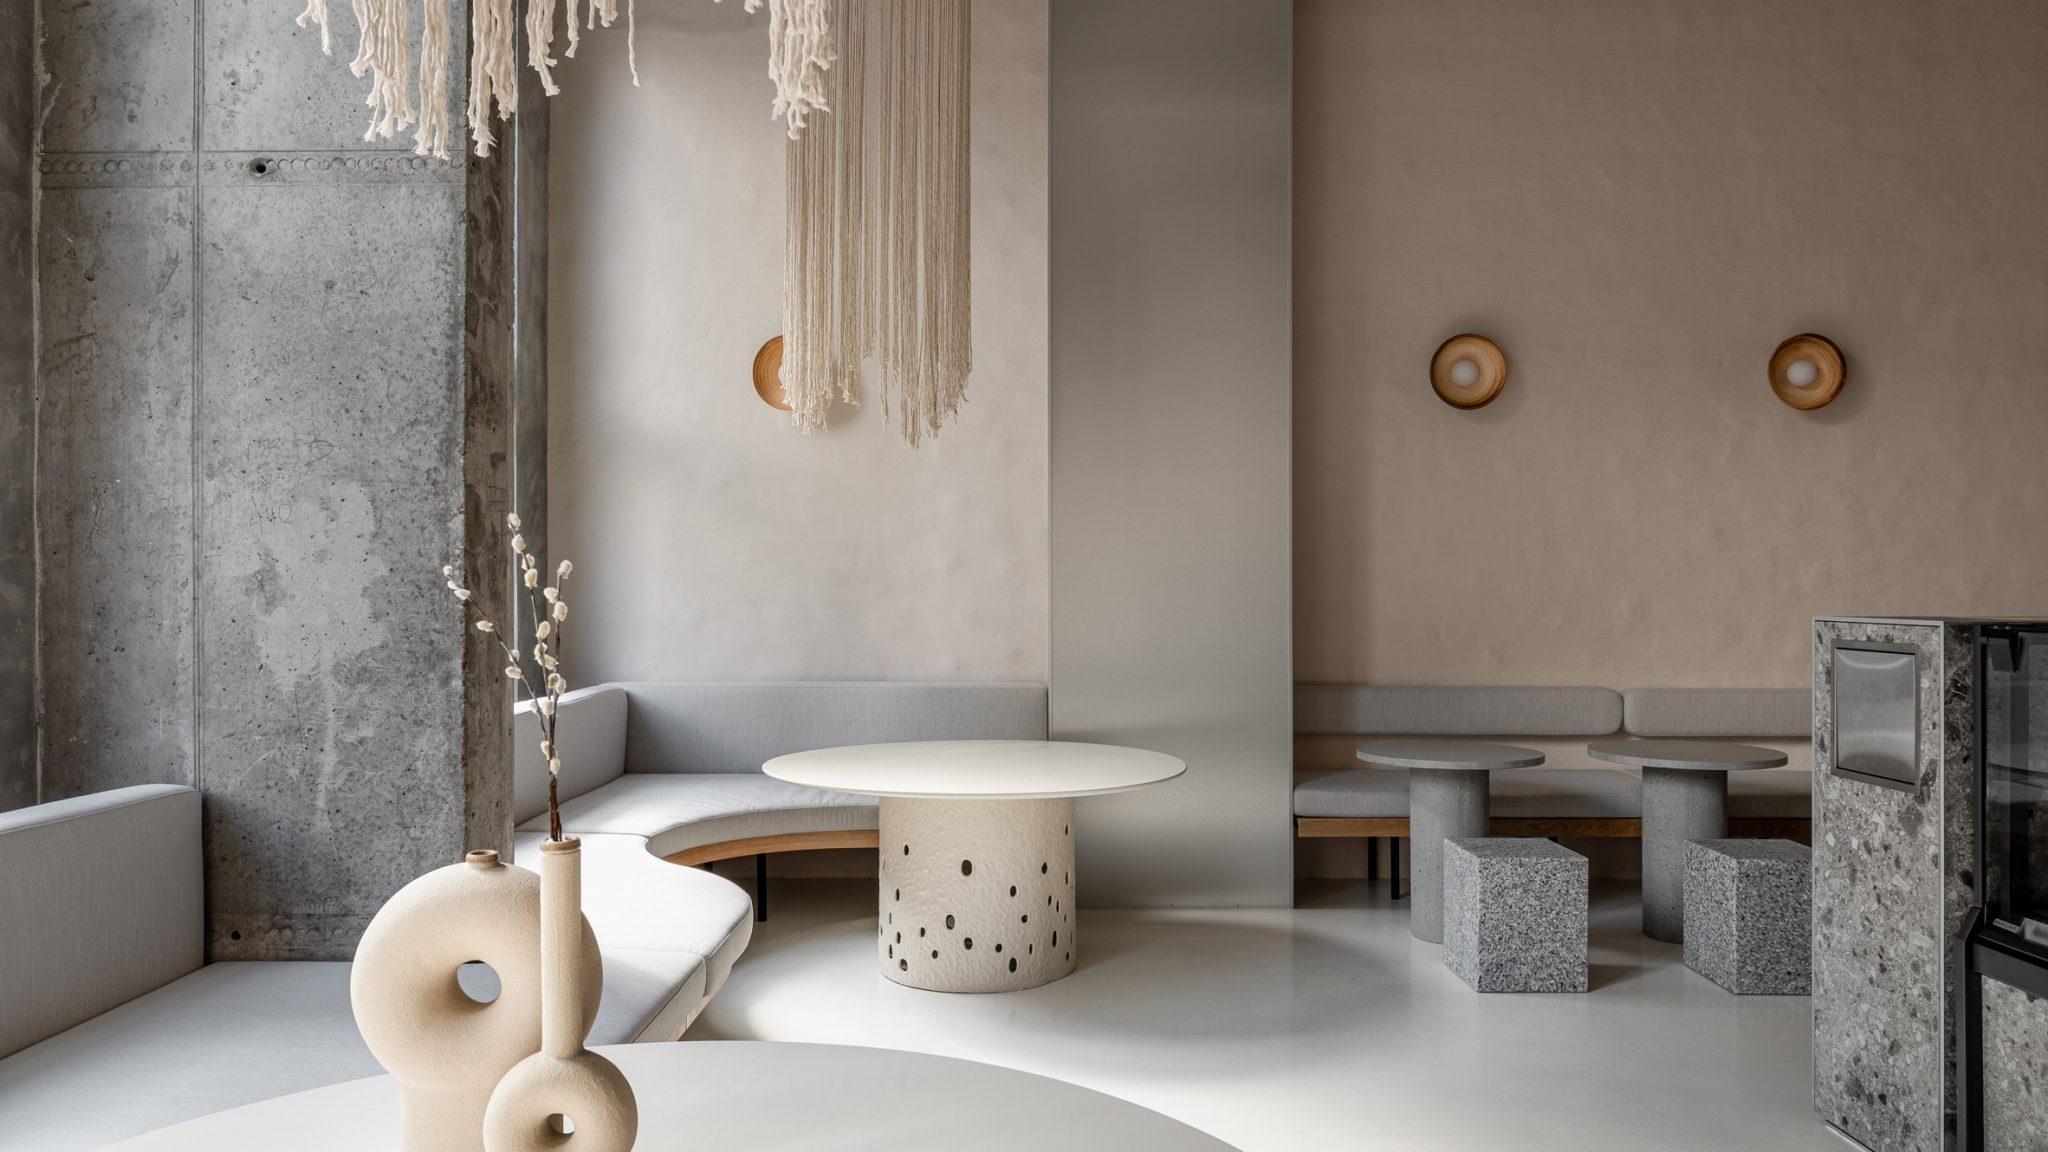 istetyka-yakusha-design-interior_dezeen_2364_col_0-2048x1152